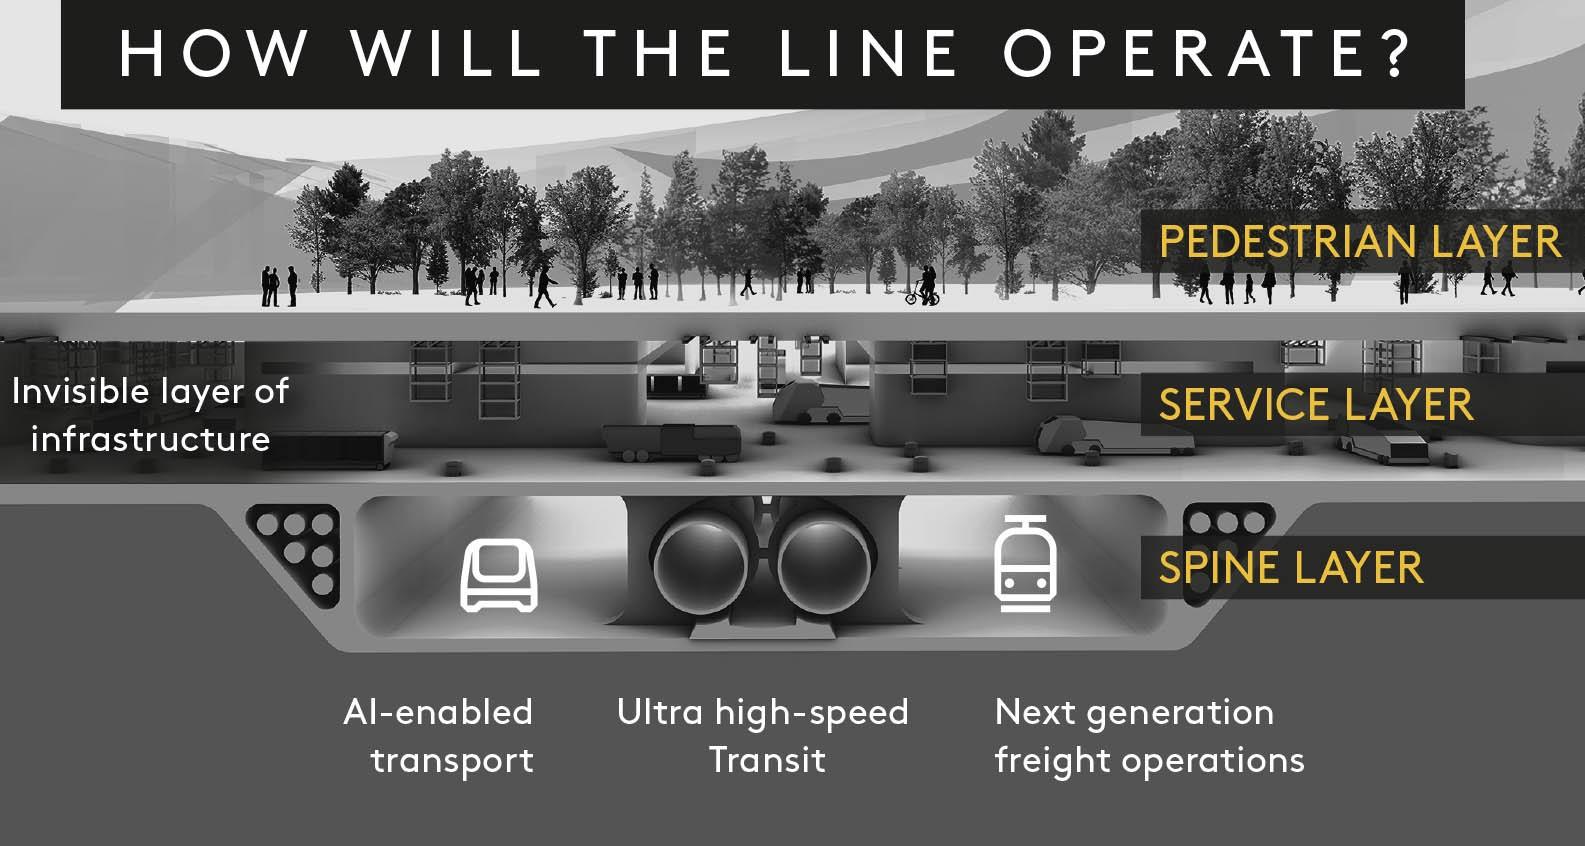 Tramsportsystem